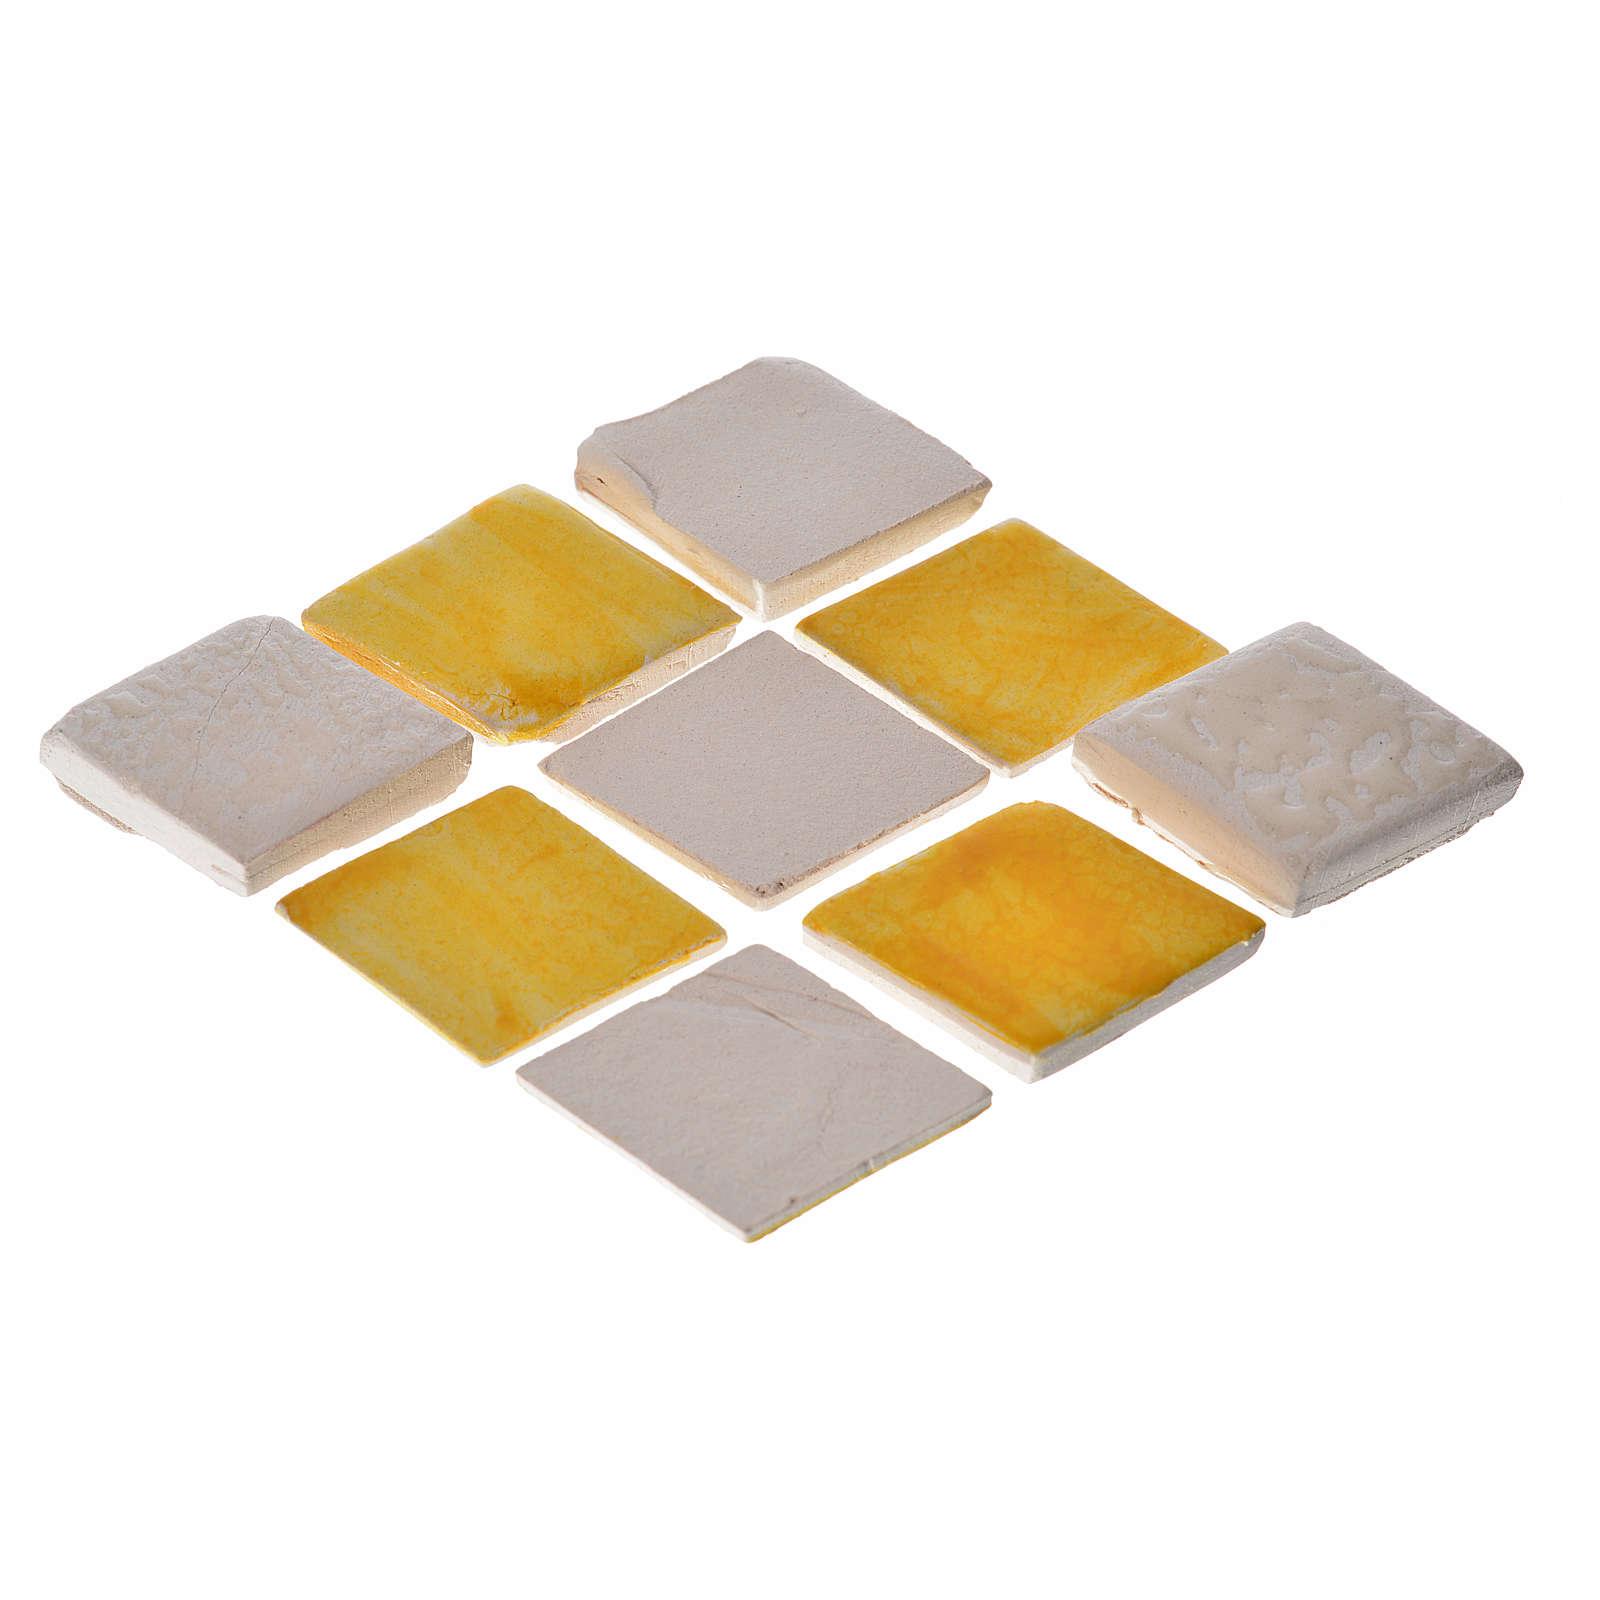 Azulejos de terracota esmaltada, 60pz romboidales amarillo 4